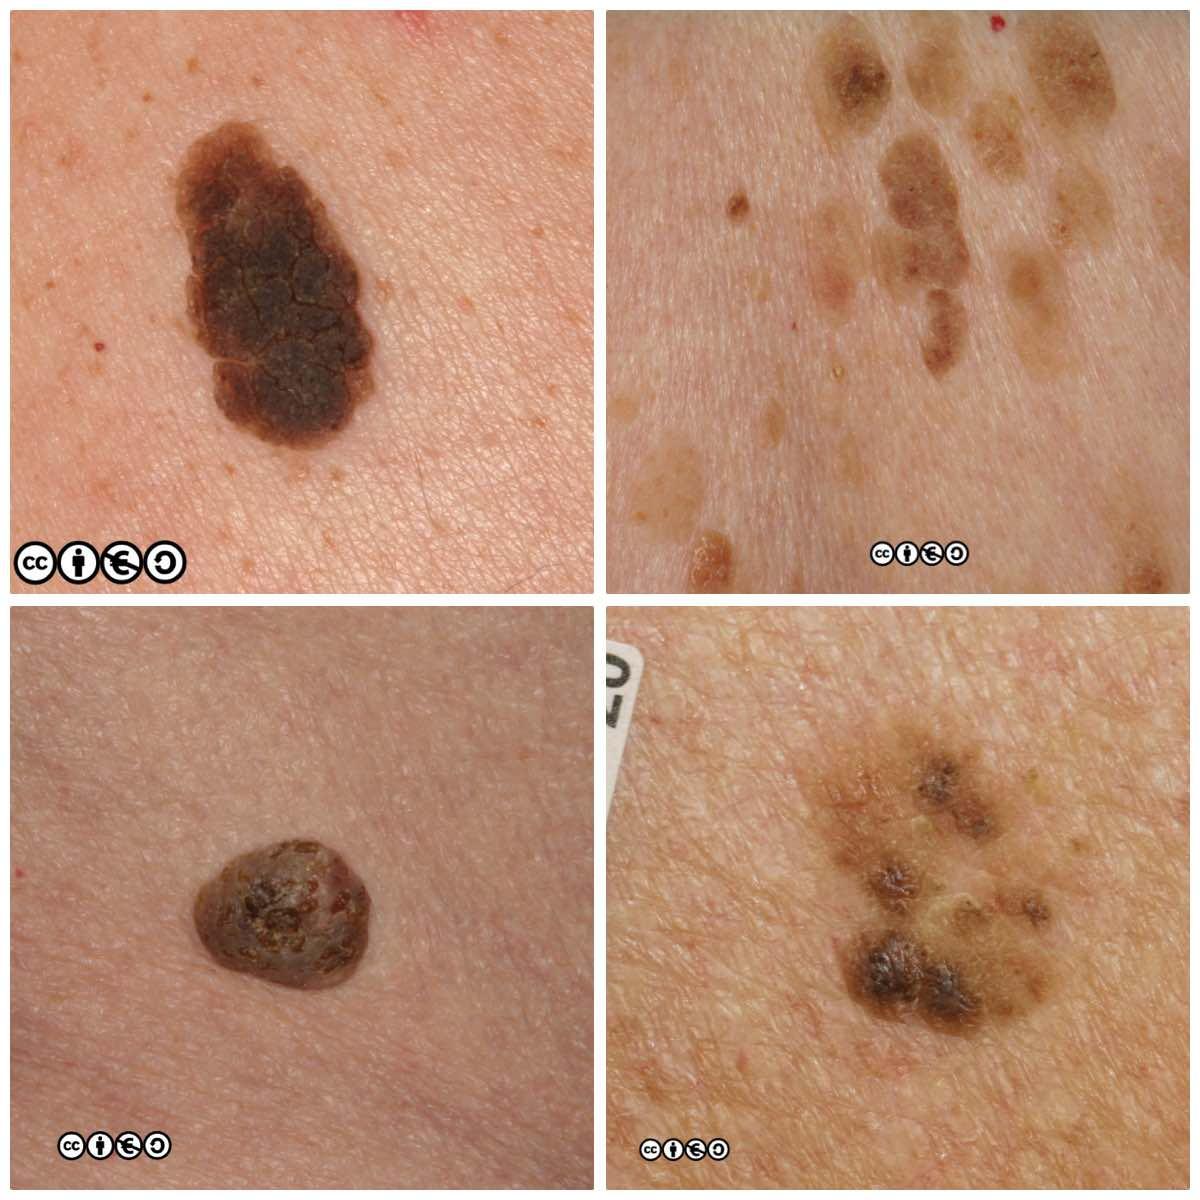 Basal cell papilloma - Basal cell papilloma